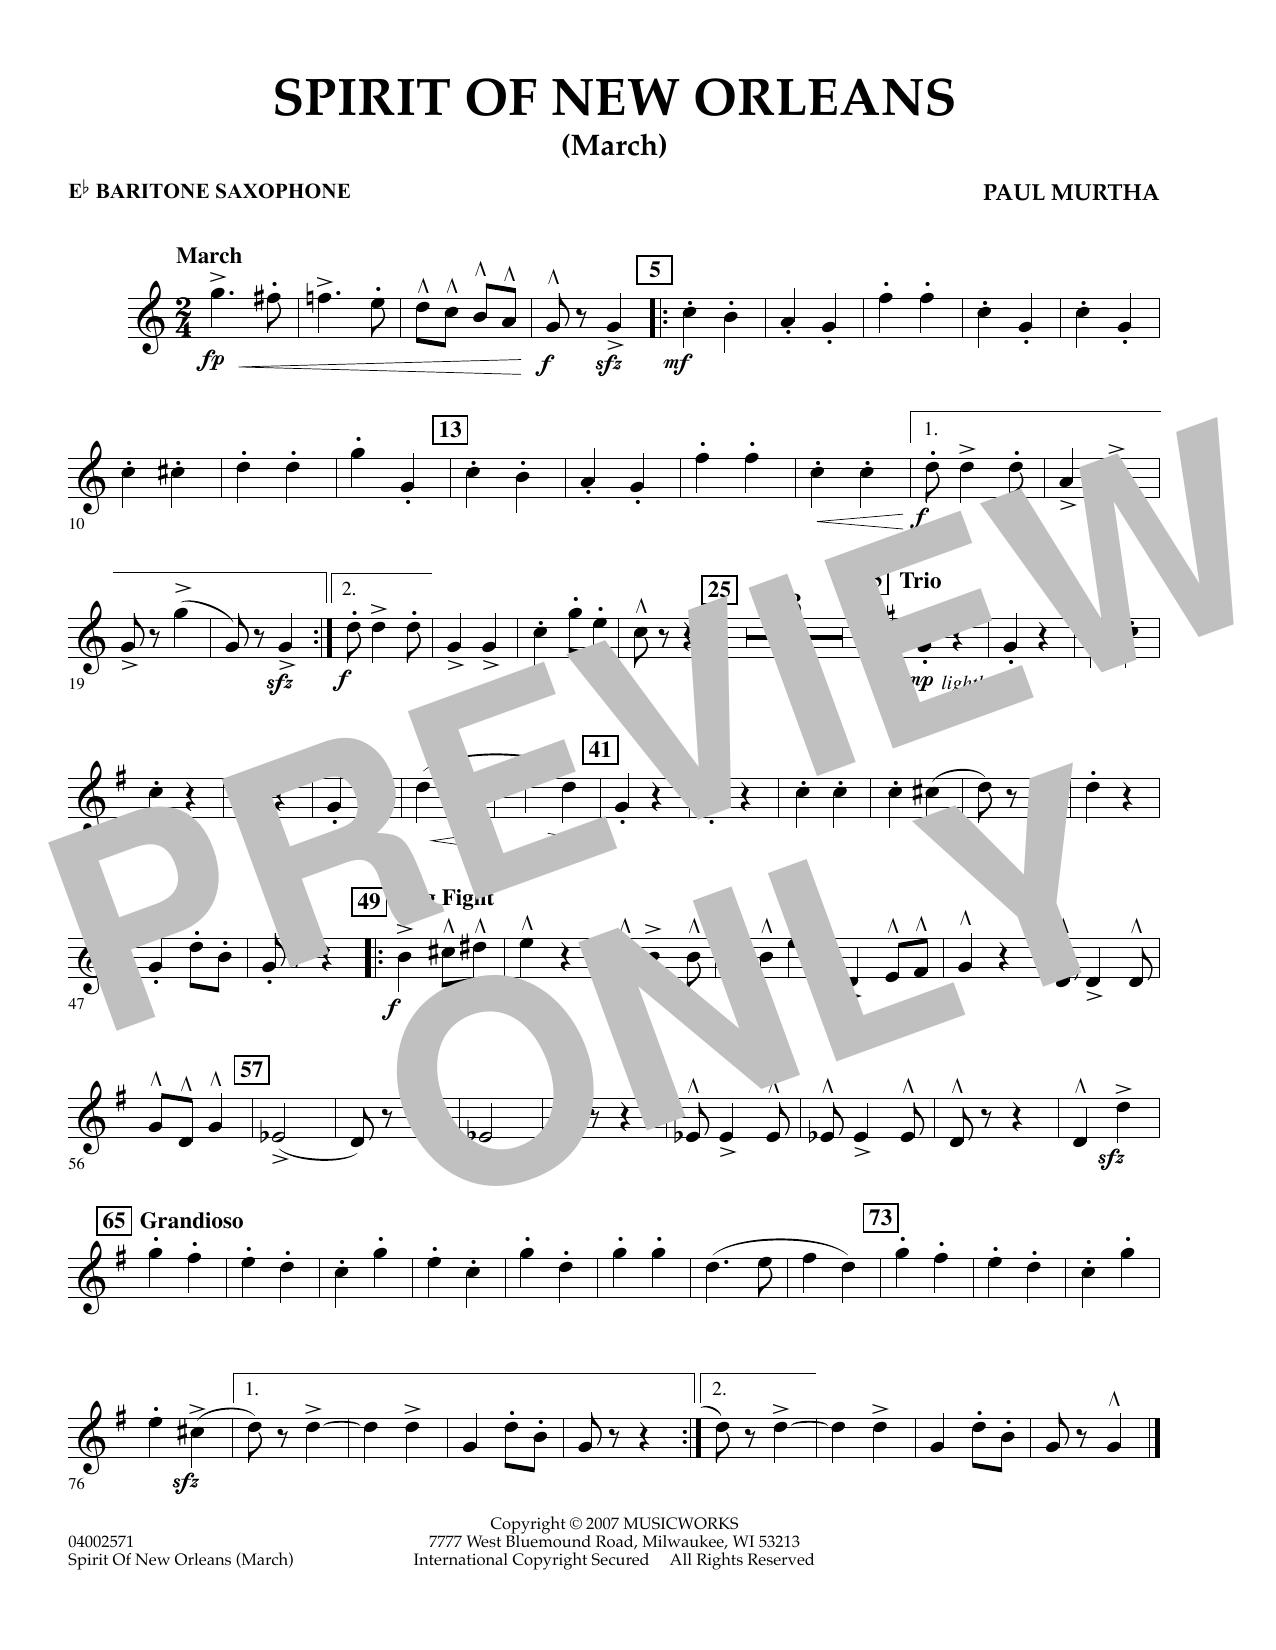 Spirit Of New Orleans (March) - Eb Baritone Saxophone sheet music